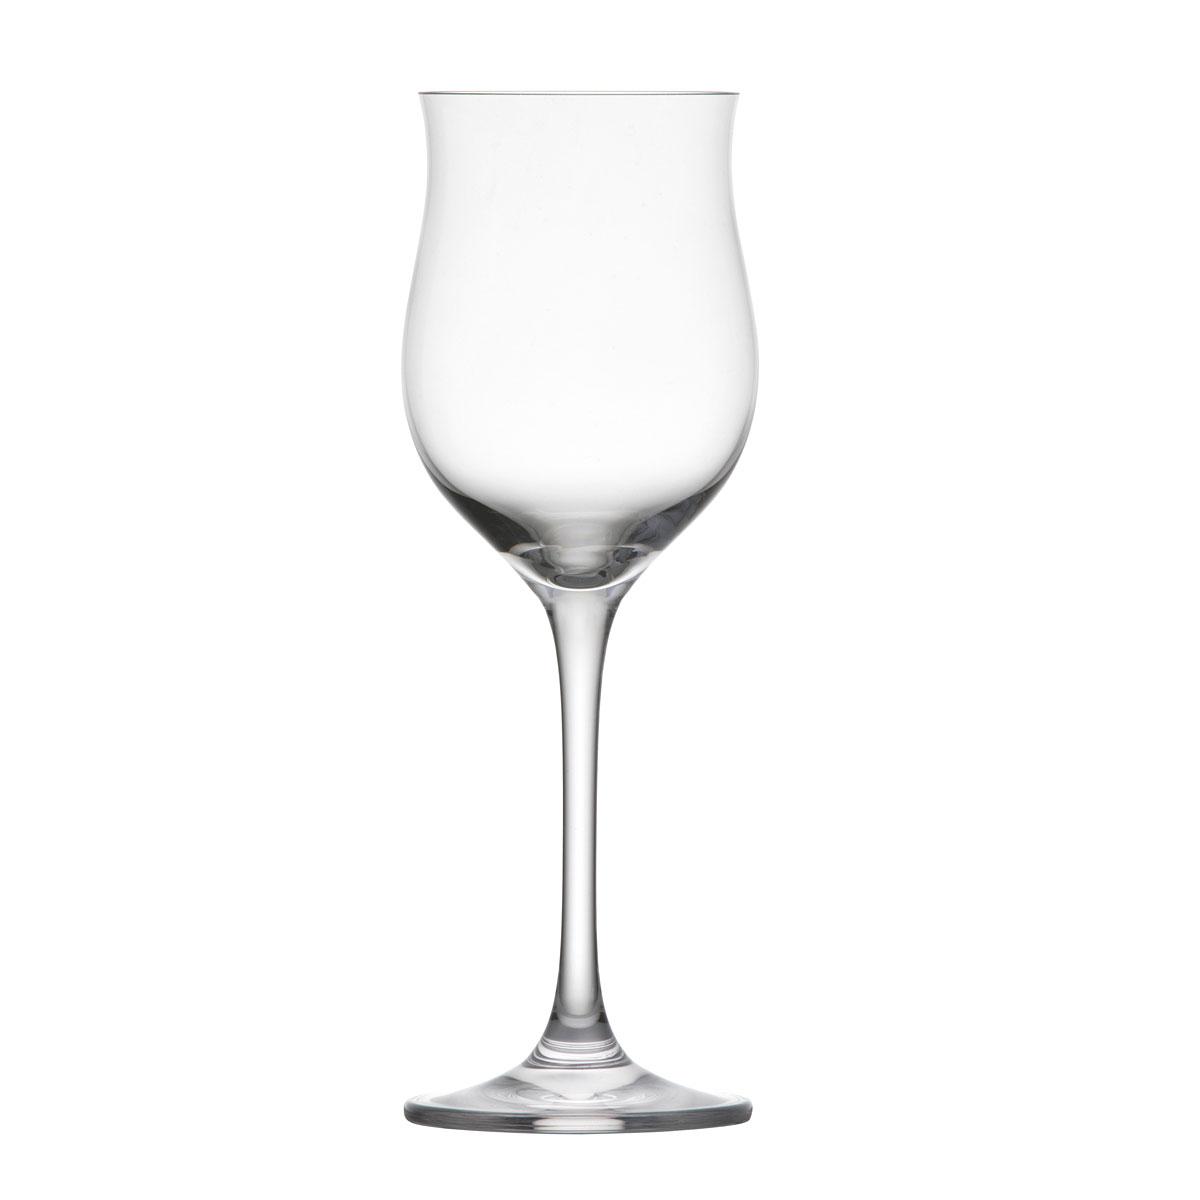 Schott Zwiesel Tritan Classico Rose with Effervescent Point, Single